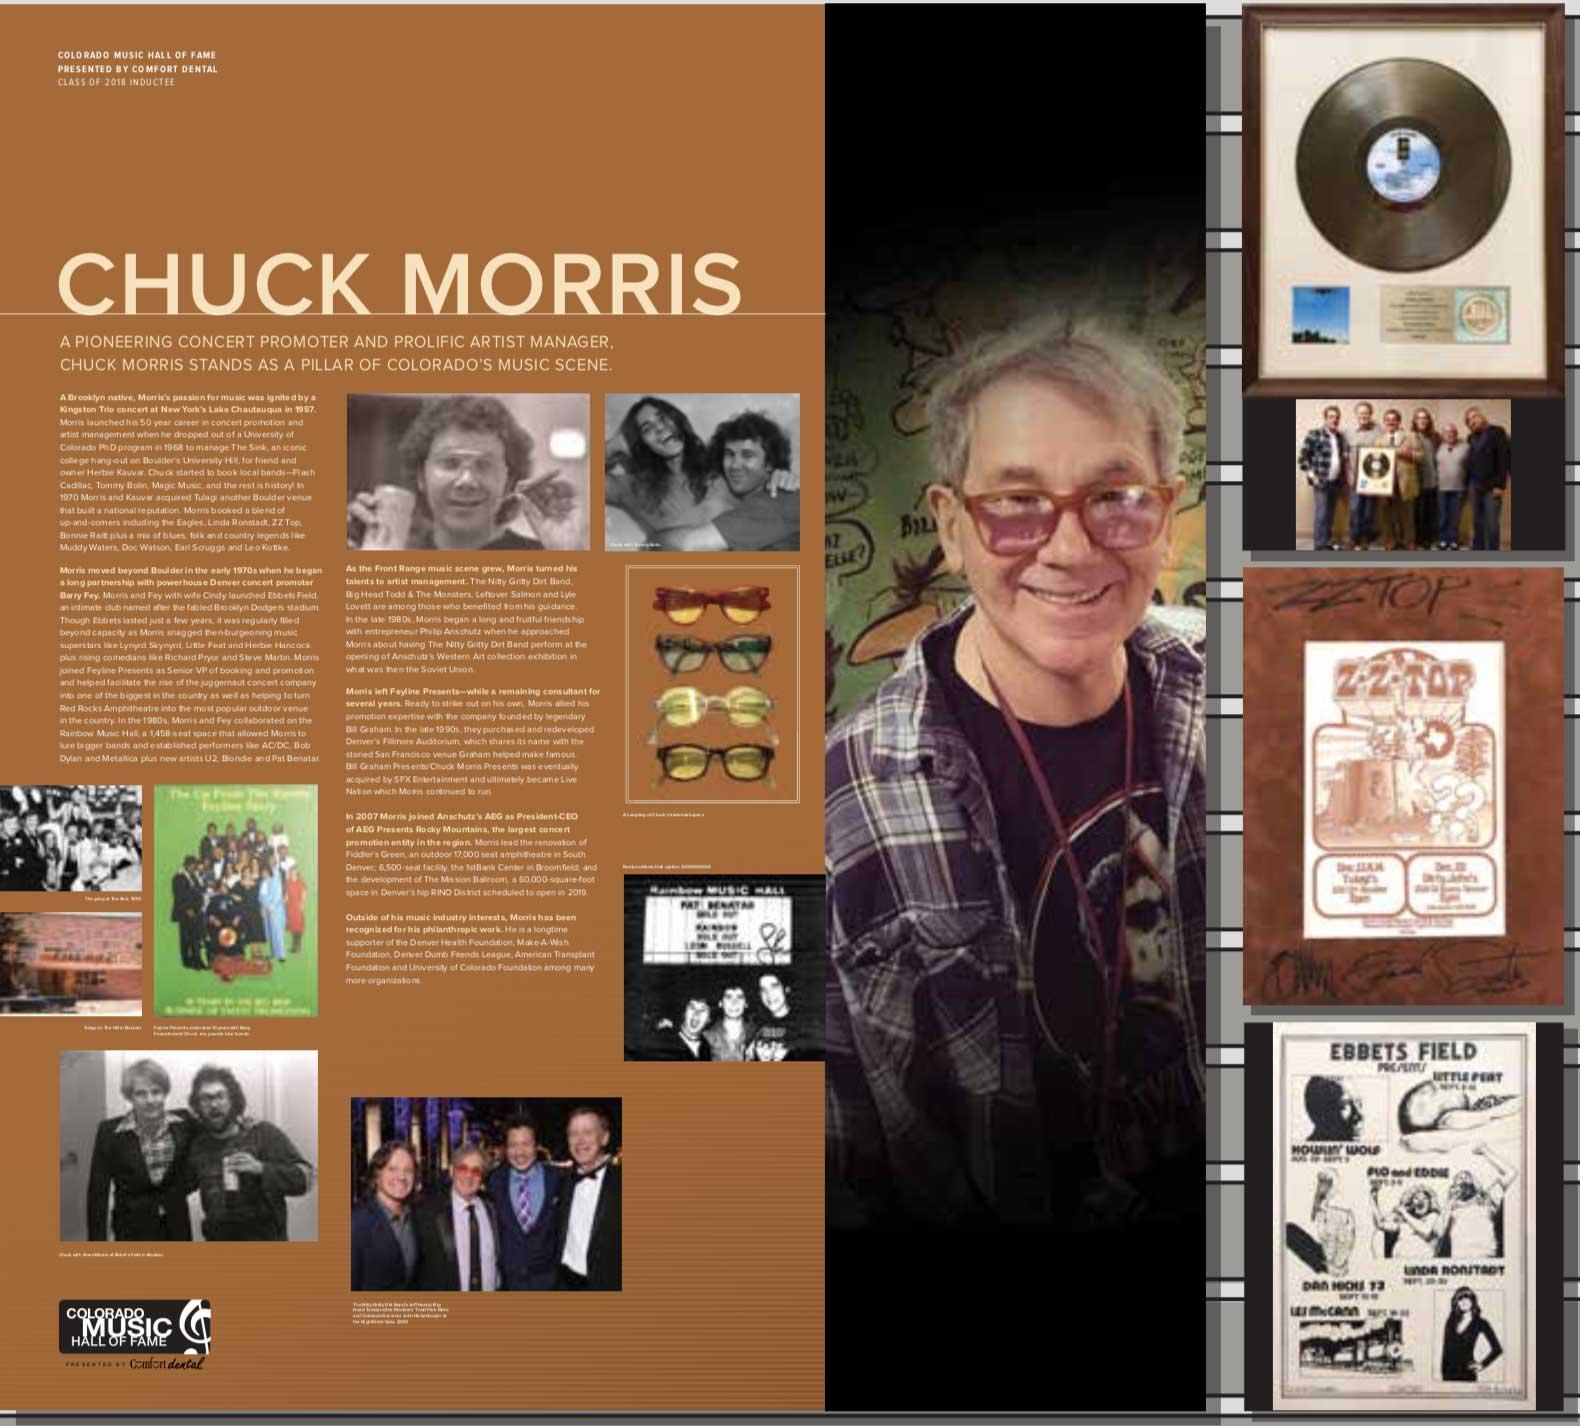 Chuck-Morris-exhibit-elevation